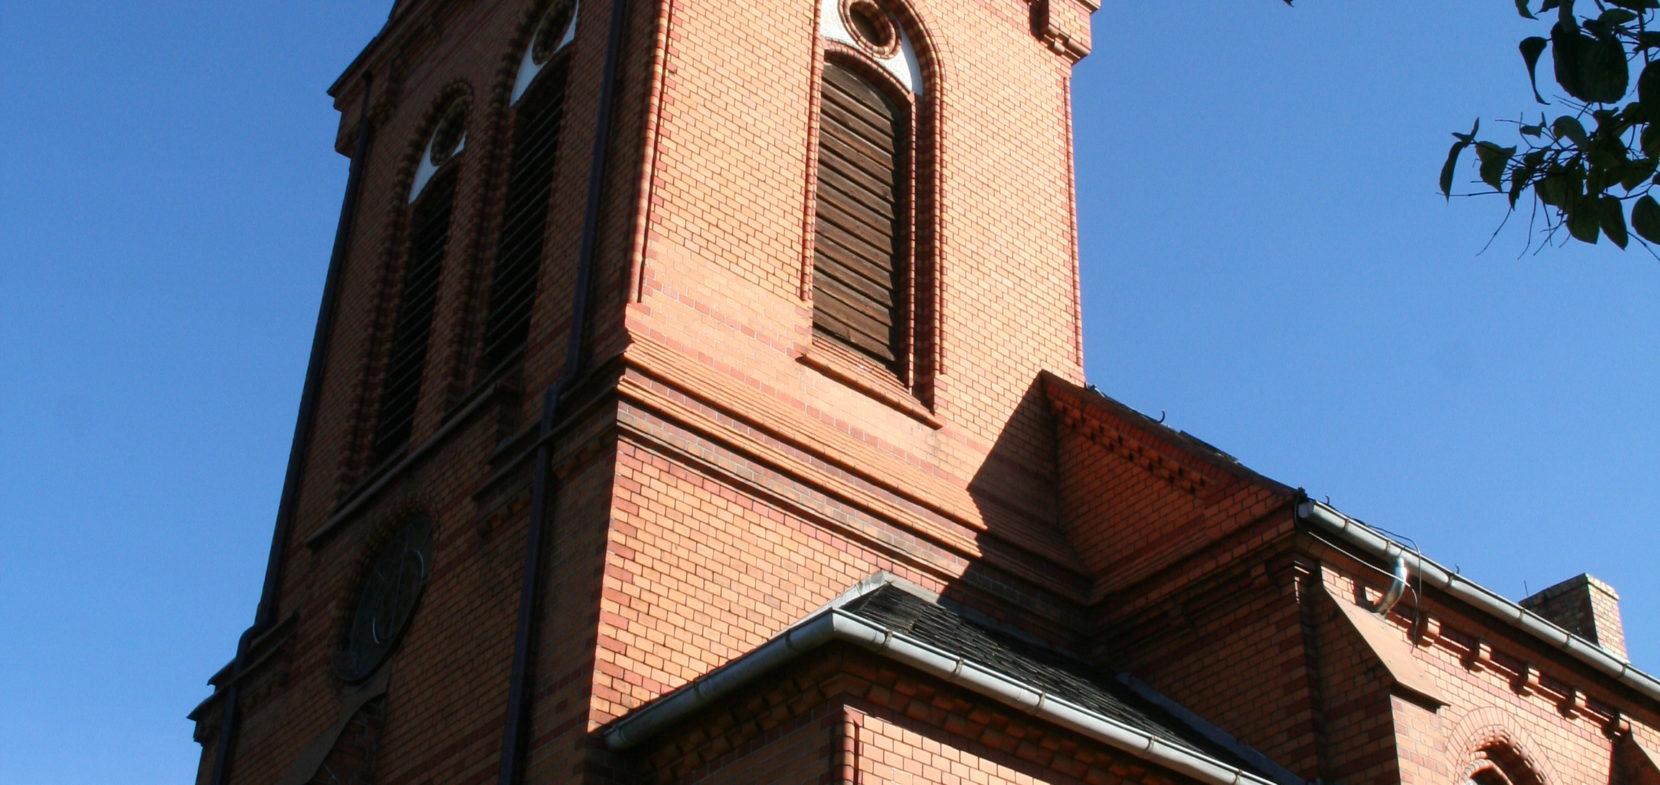 Ev.-Luth. Kirchgemeinde Marieney-Wohlbach